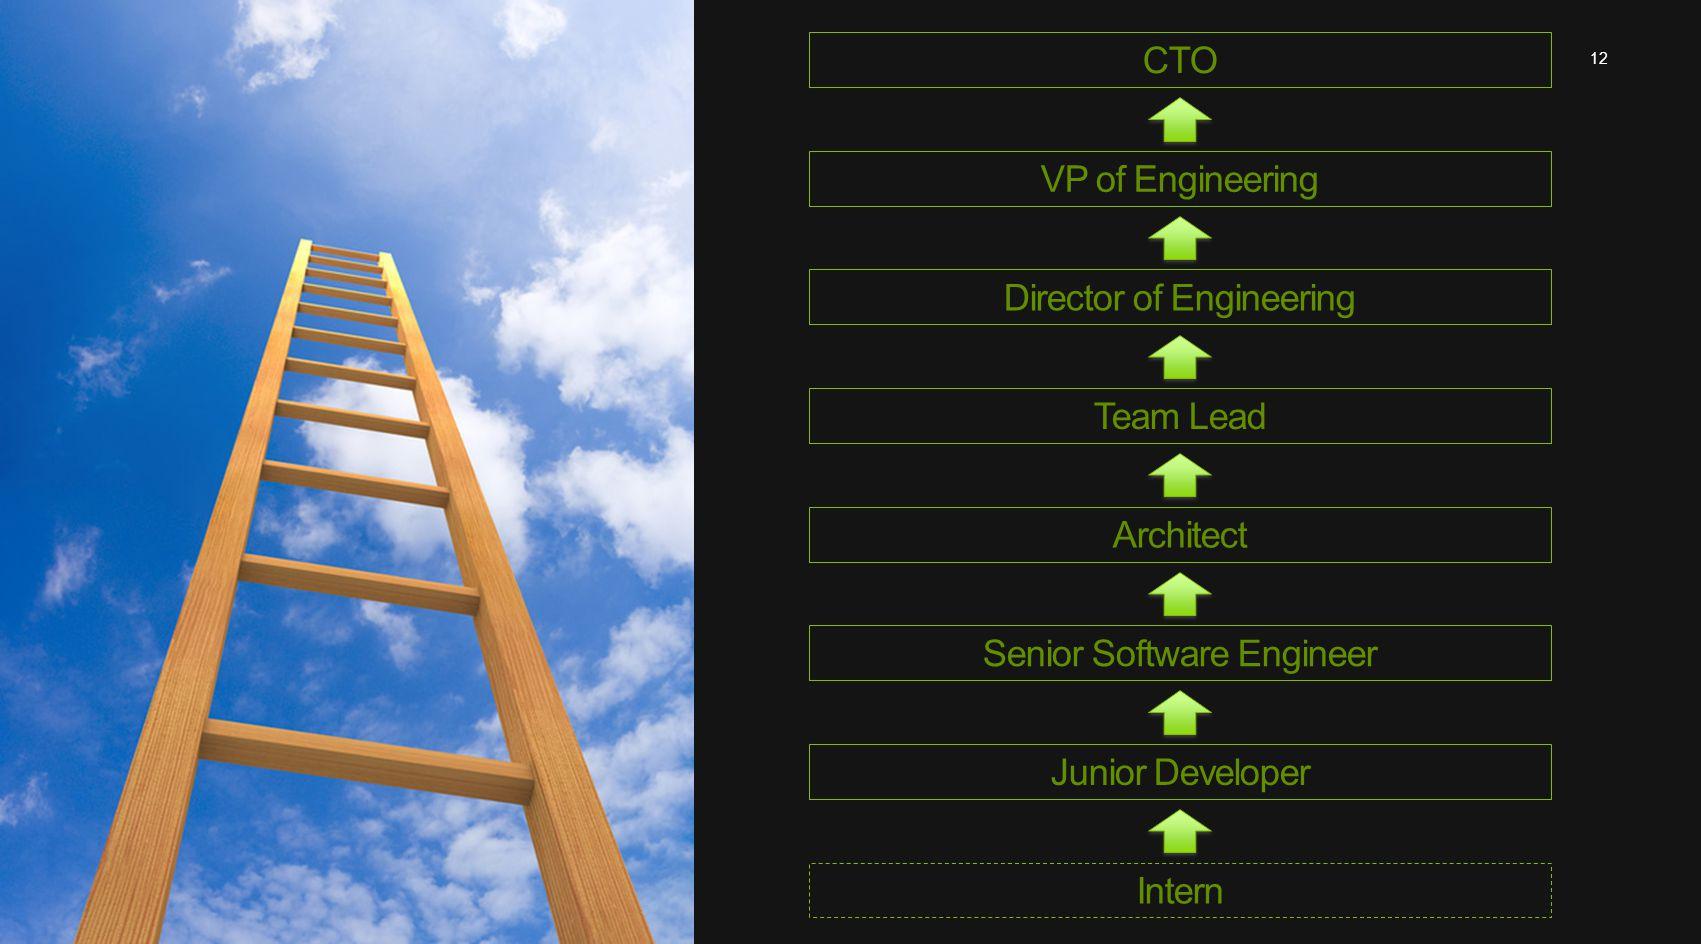 12 Intern Junior DeveloperSenior Software EngineerArchitectTeam LeadDirector of EngineeringVP of EngineeringCTO